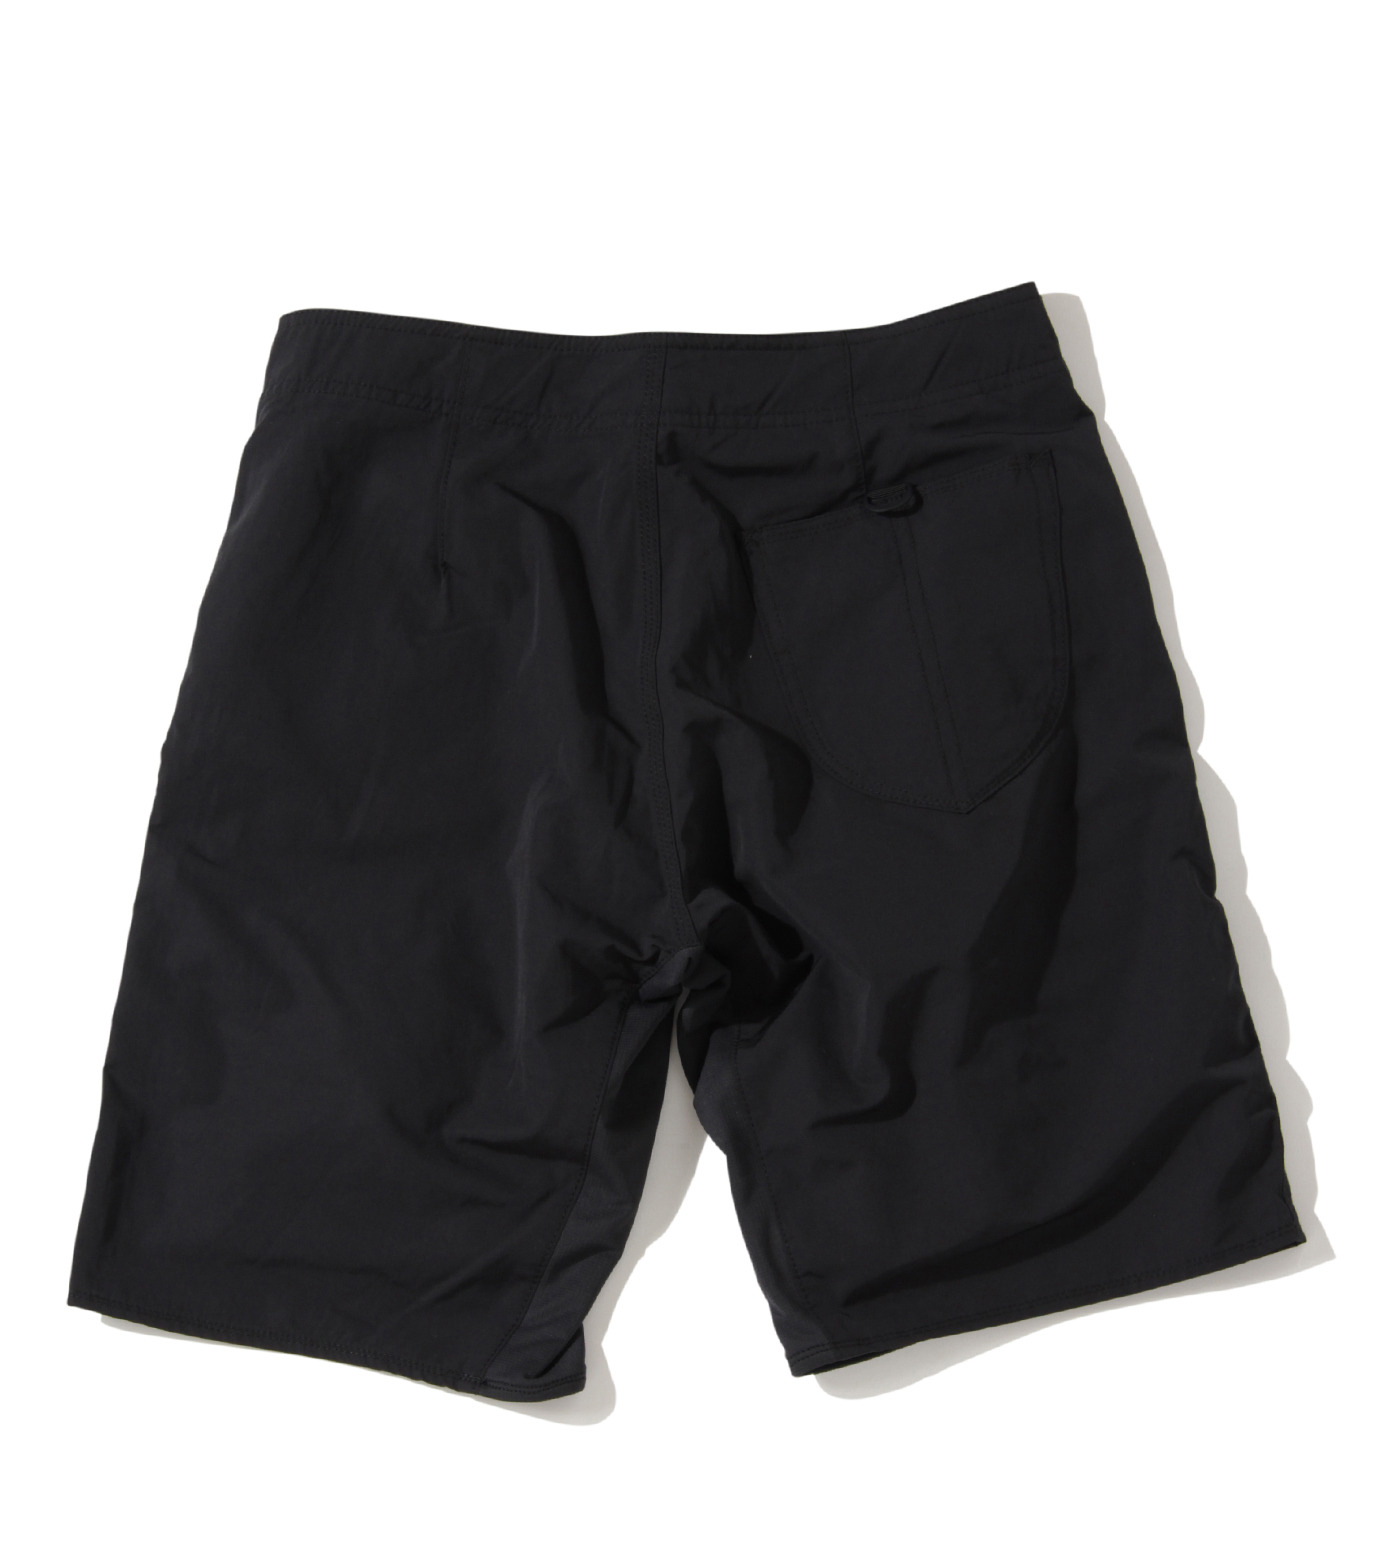 TWO TWO ONE(トゥートゥーワン)のSurf shorts long-BLACK(SWIMWEAR/SWIMWEAR)-15N948002-13 拡大詳細画像2